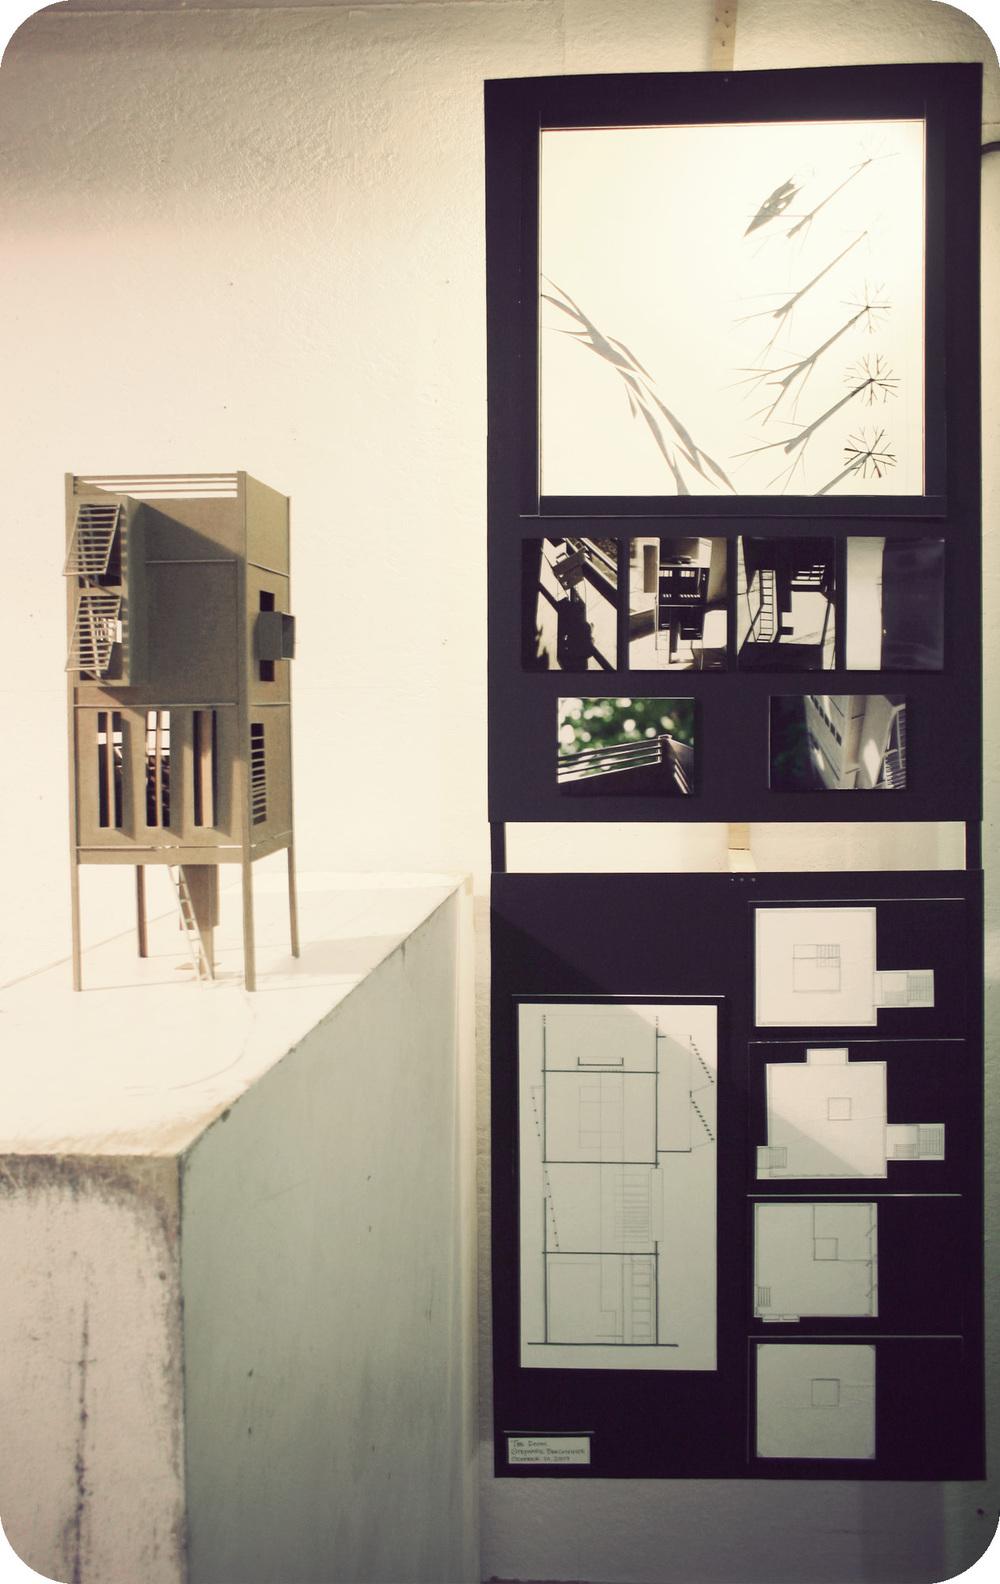 The Room_09.jpg